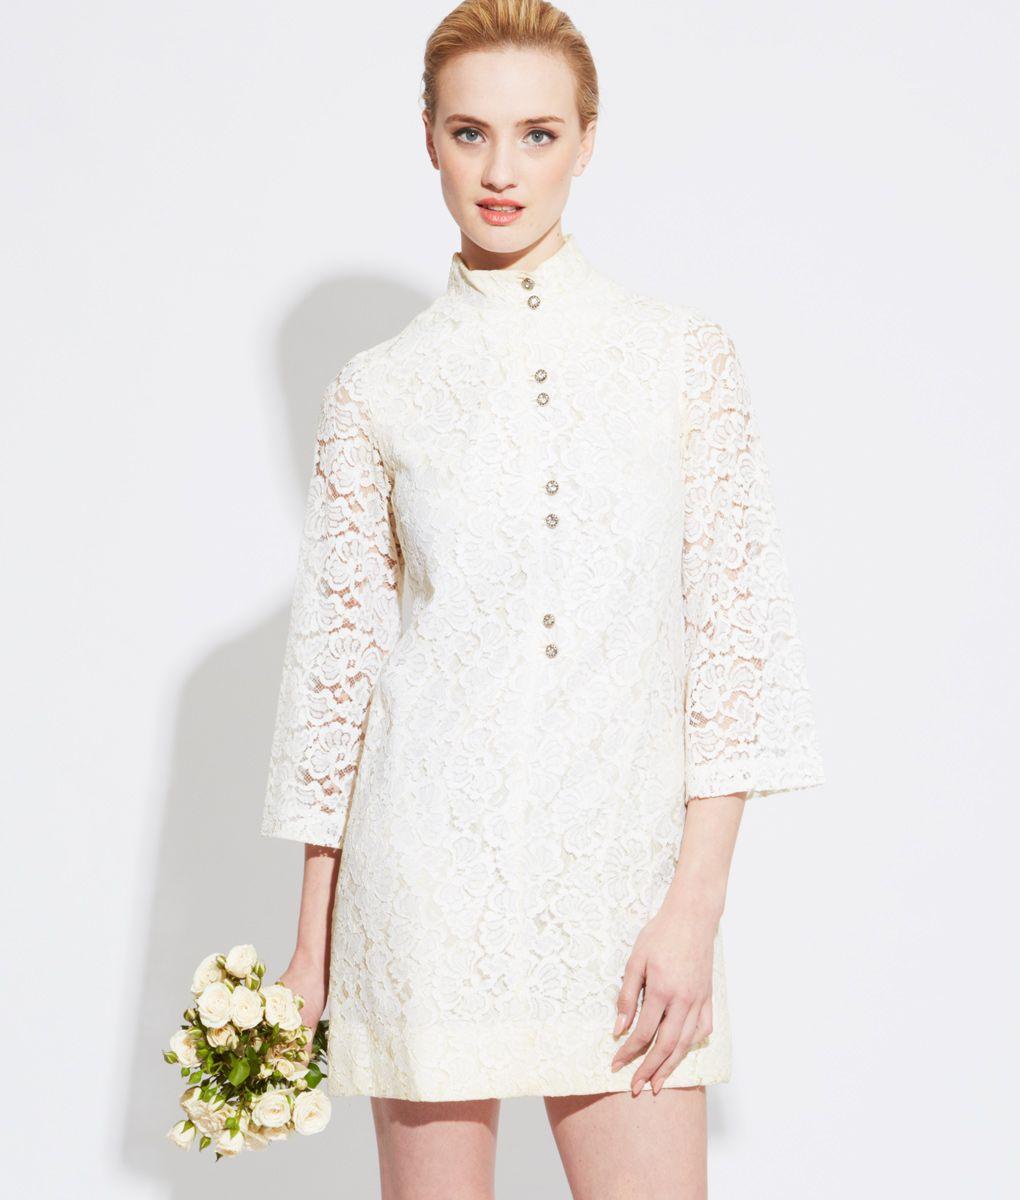 Vintage lace wedding dress josie stardust vintage pinterest